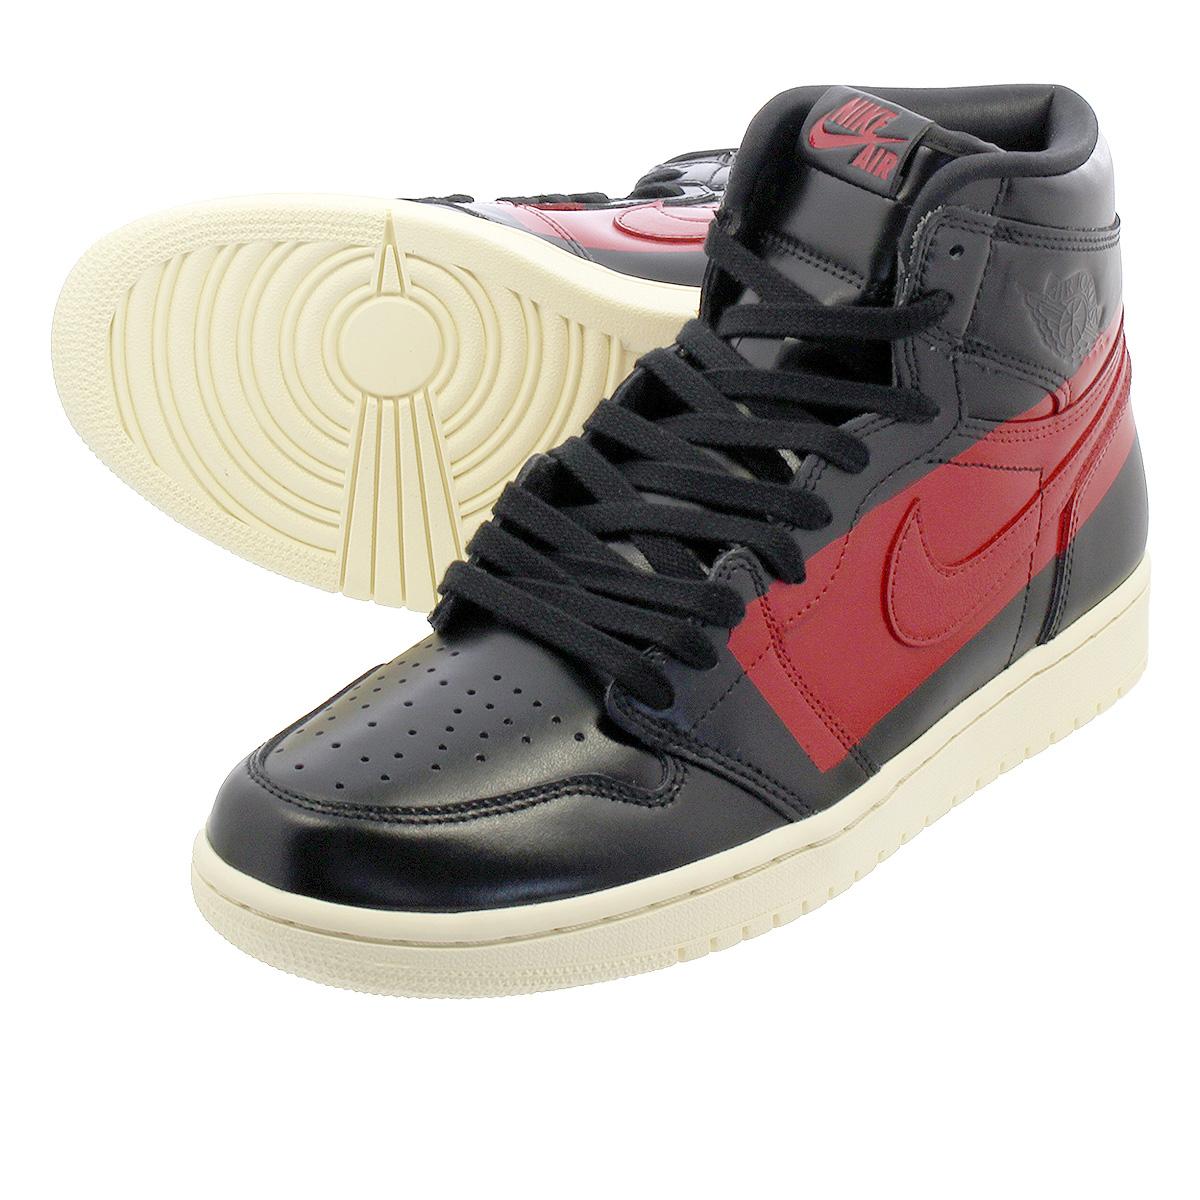 huge inventory 77d62 afa47 NIKE AIR JORDAN 1 RETRO HIGH OG DEFIANT Nike Air Jordan 1 nostalgic high OG  ディファイント BLACK UNIVERSITY RED MUSLIN bq6682-006